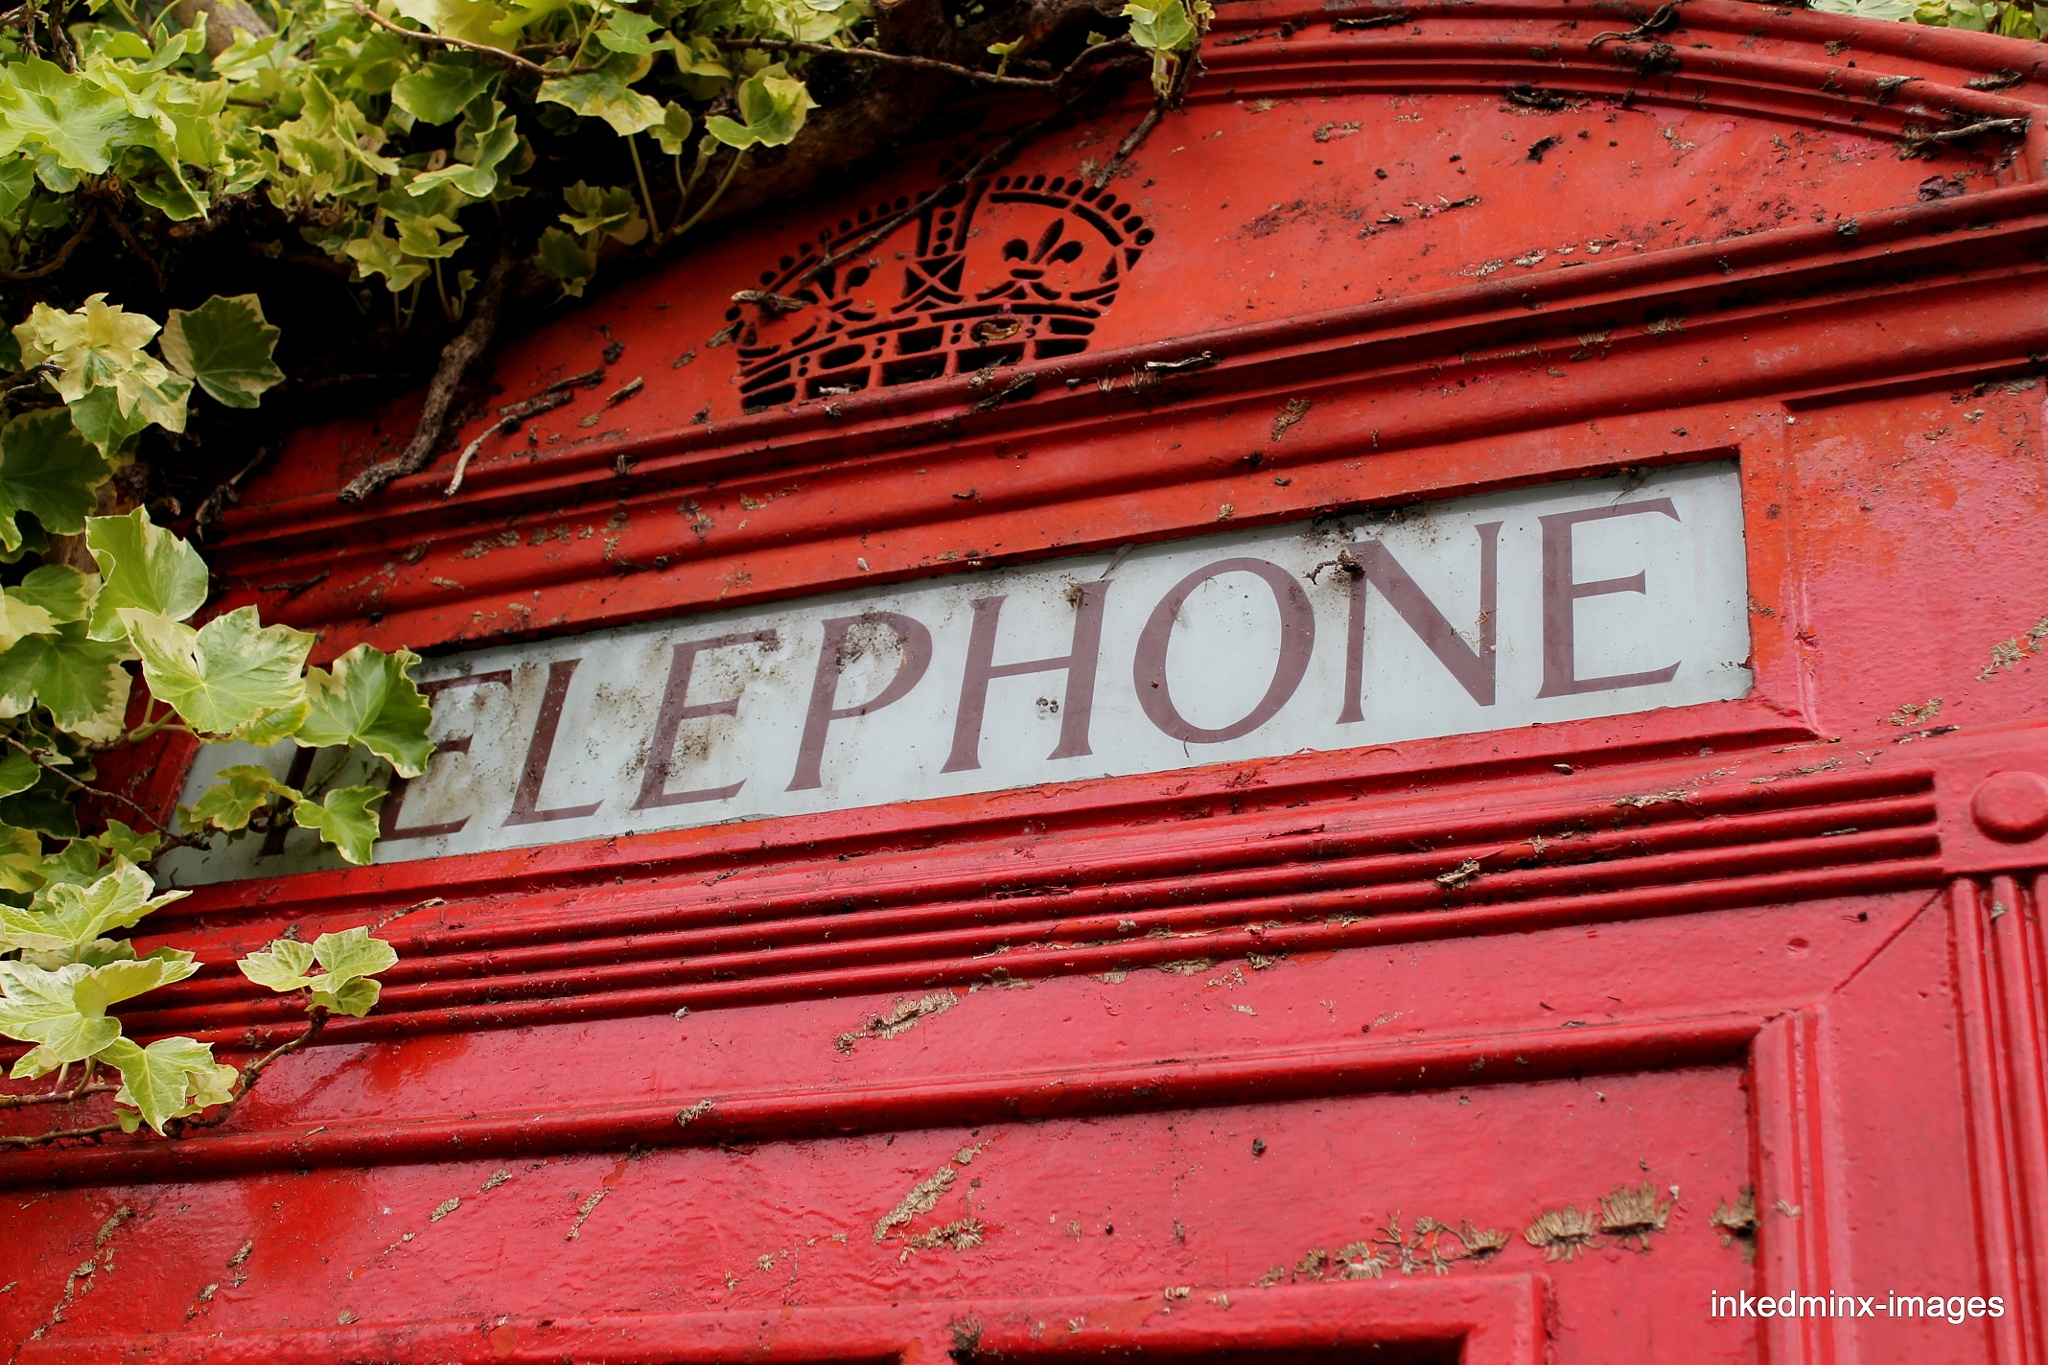 traditional phonebox by Miranda Inked-minx Watkins